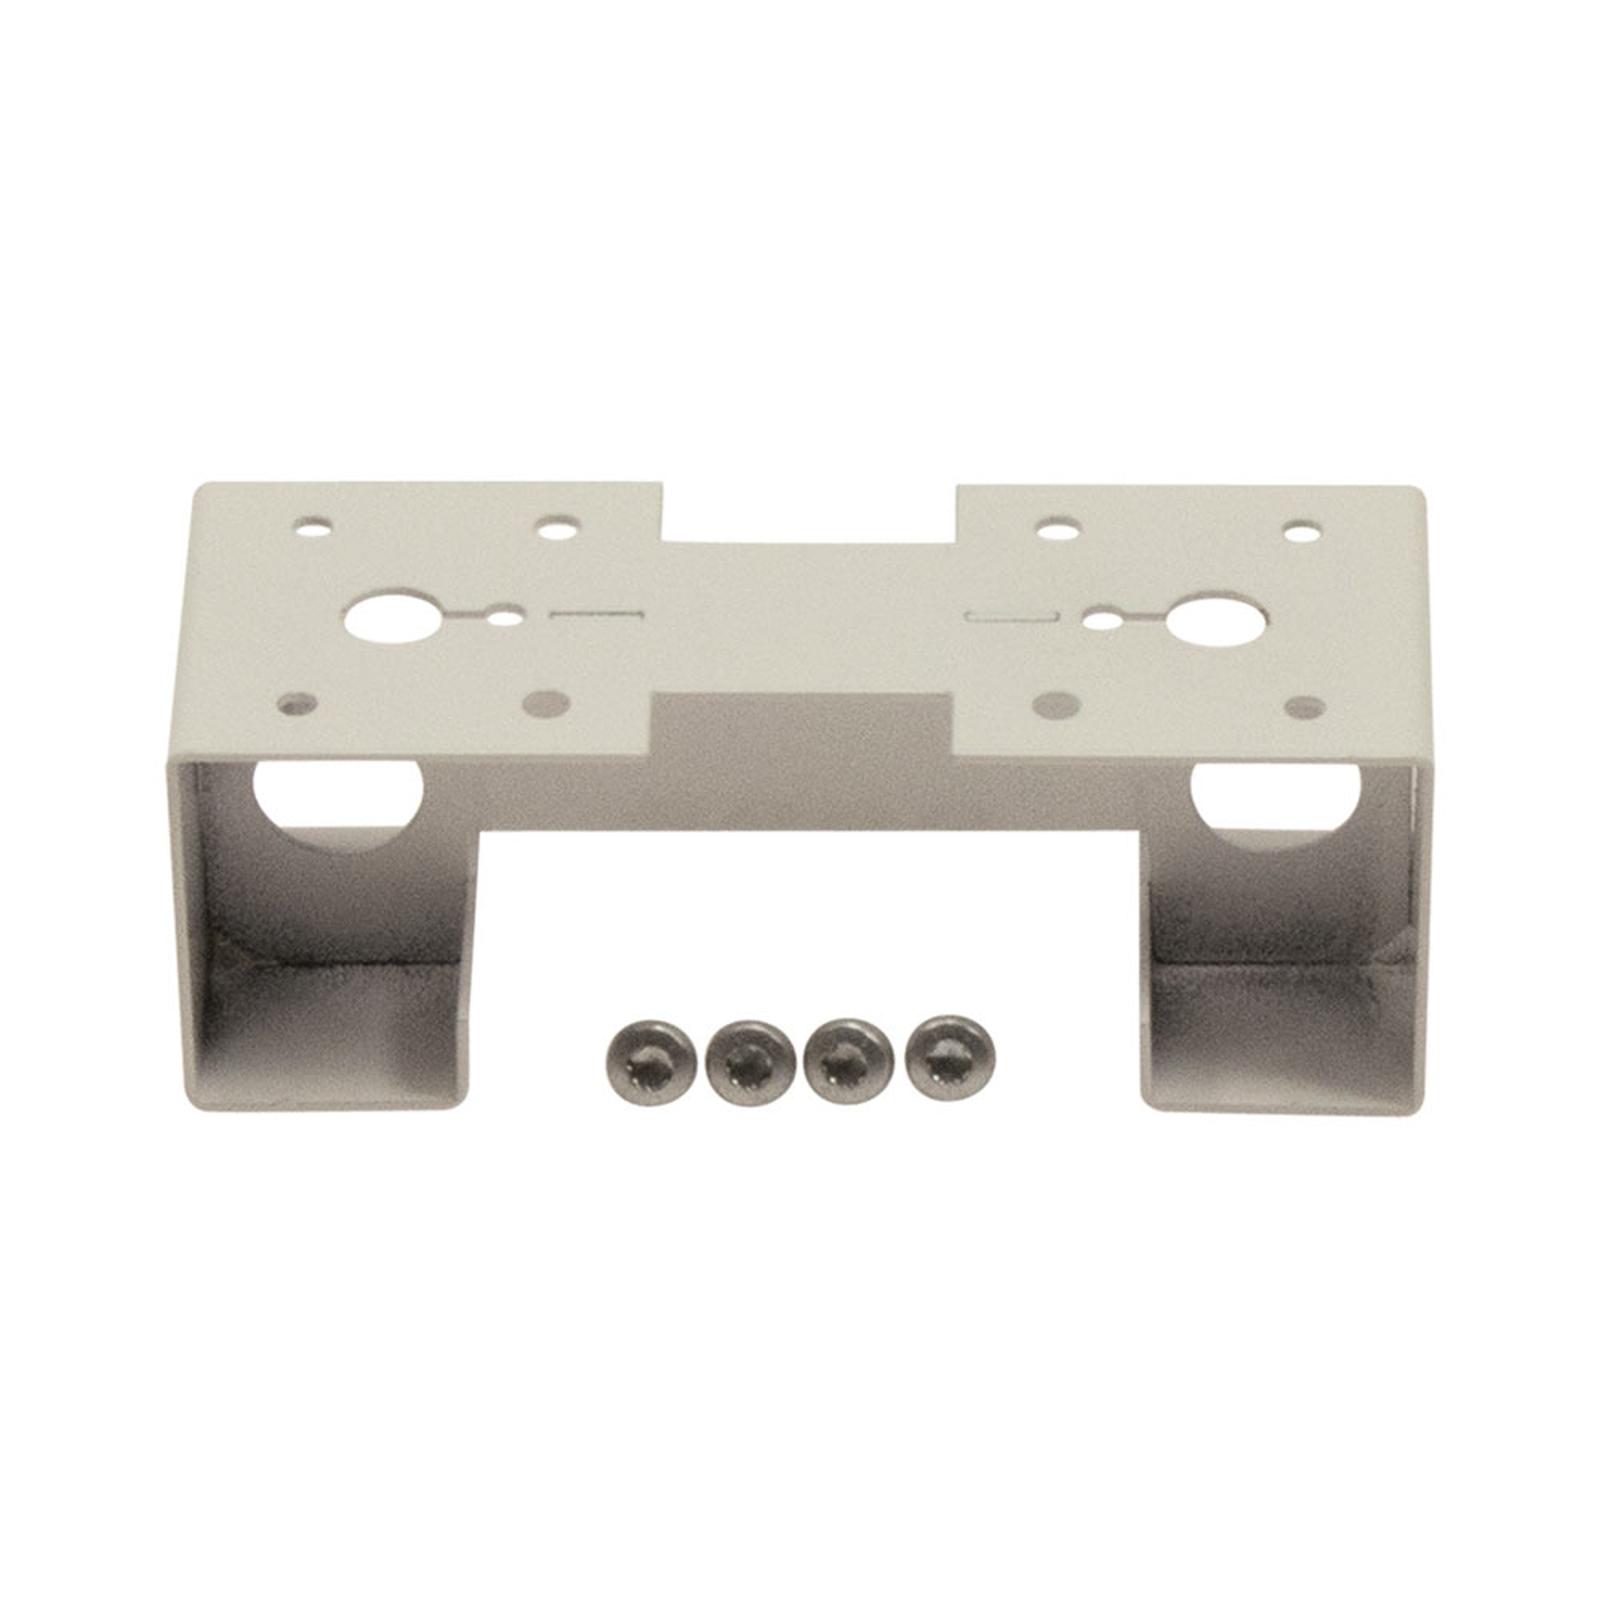 Forbinder Procube-CUV-1 0° for DL Procube